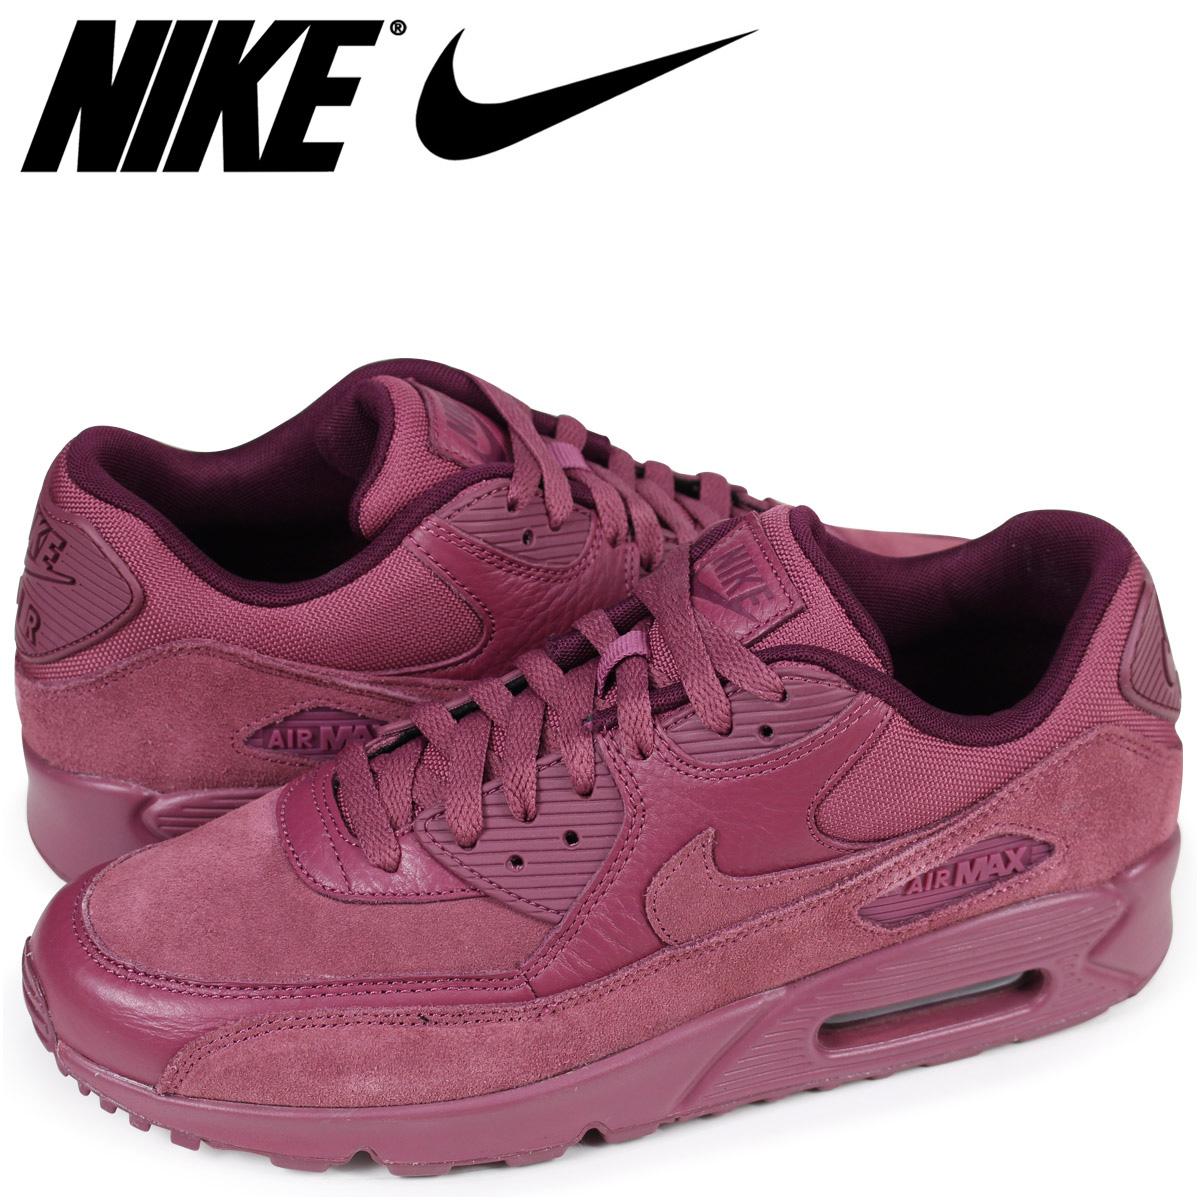 on sale 3ebb9 c1a7f Nike NIKE Air Max 90 sneakers men AIR MAX 90 PREMIUM 700,155-601 red